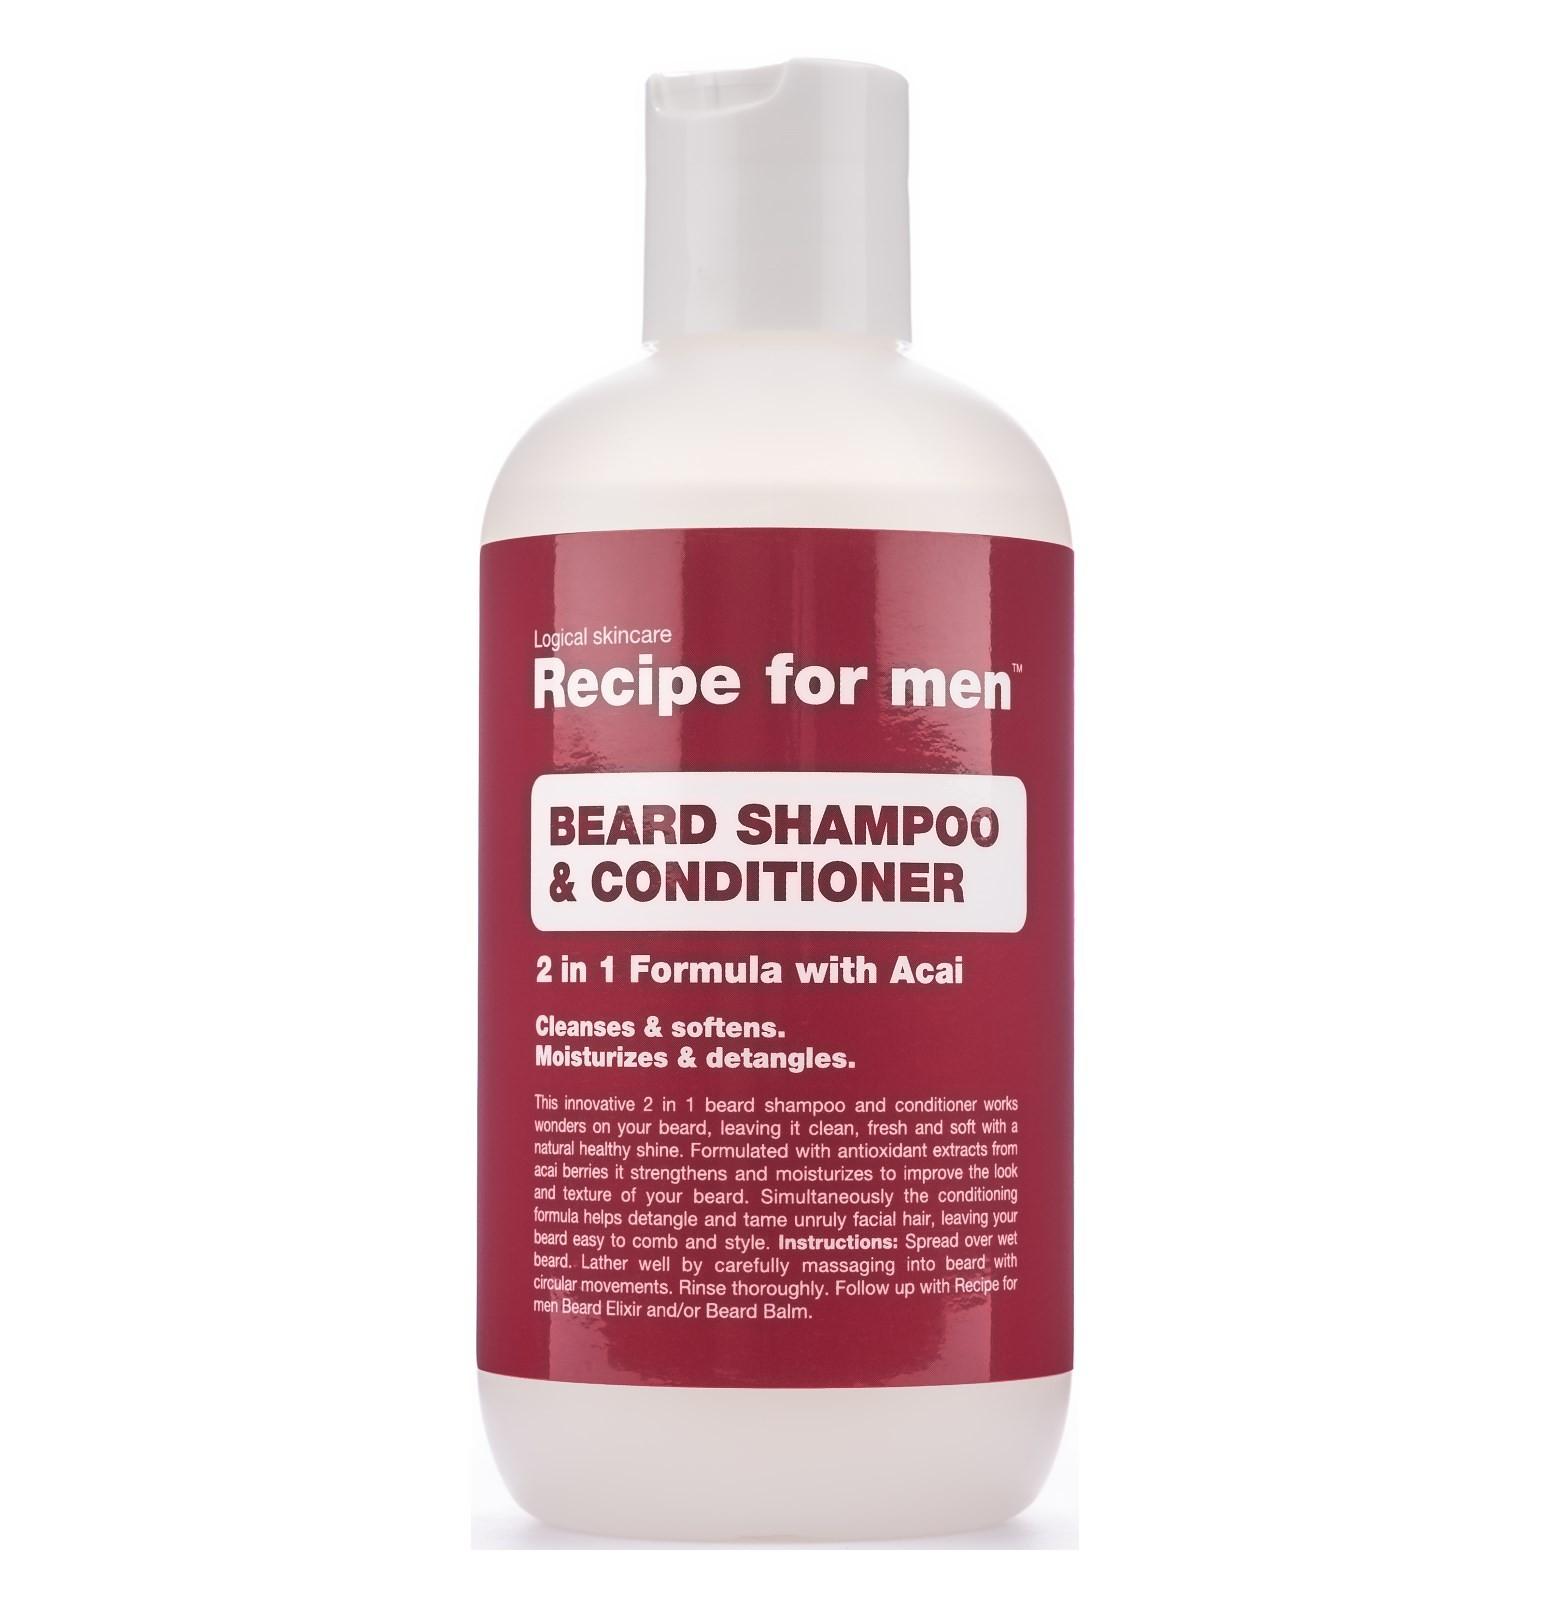 Recipe for Men Beard Shampoo & Conditioner